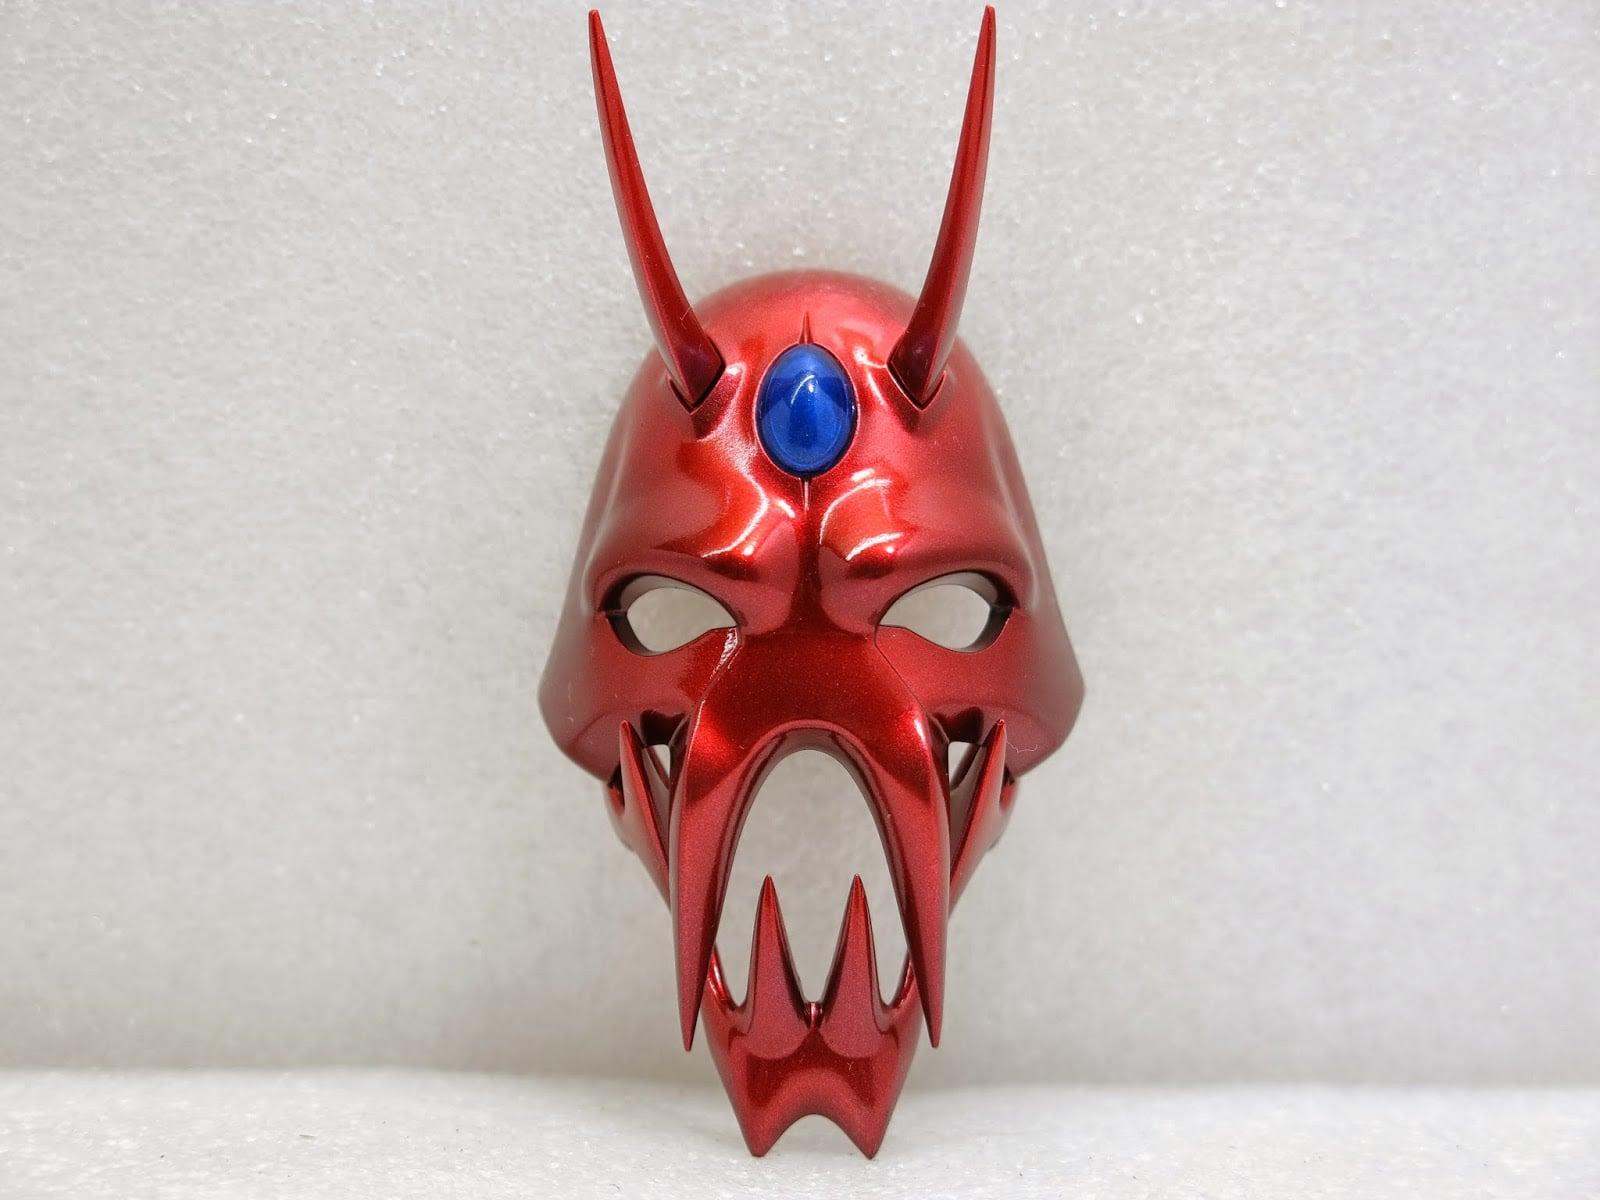 Toy Model Ghost Mask 03 約瑟夫模型:鬼面 SRG-S034~PERSON-LICHKEIT 超級機器人大戰 OG